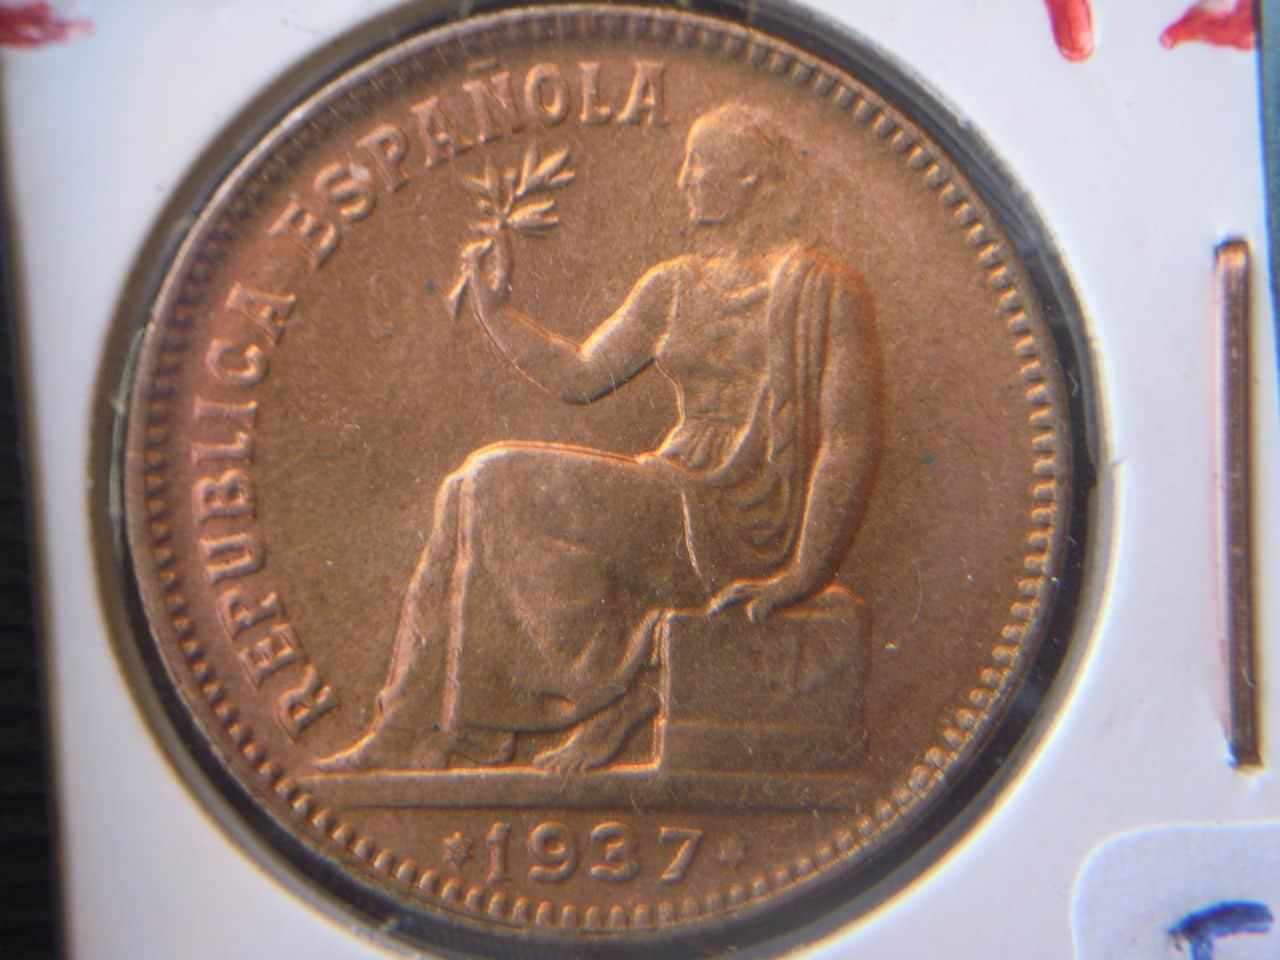 50 Centimos 1937 *34  II Republica - con cual me quedo? 50_centimos_1937_001